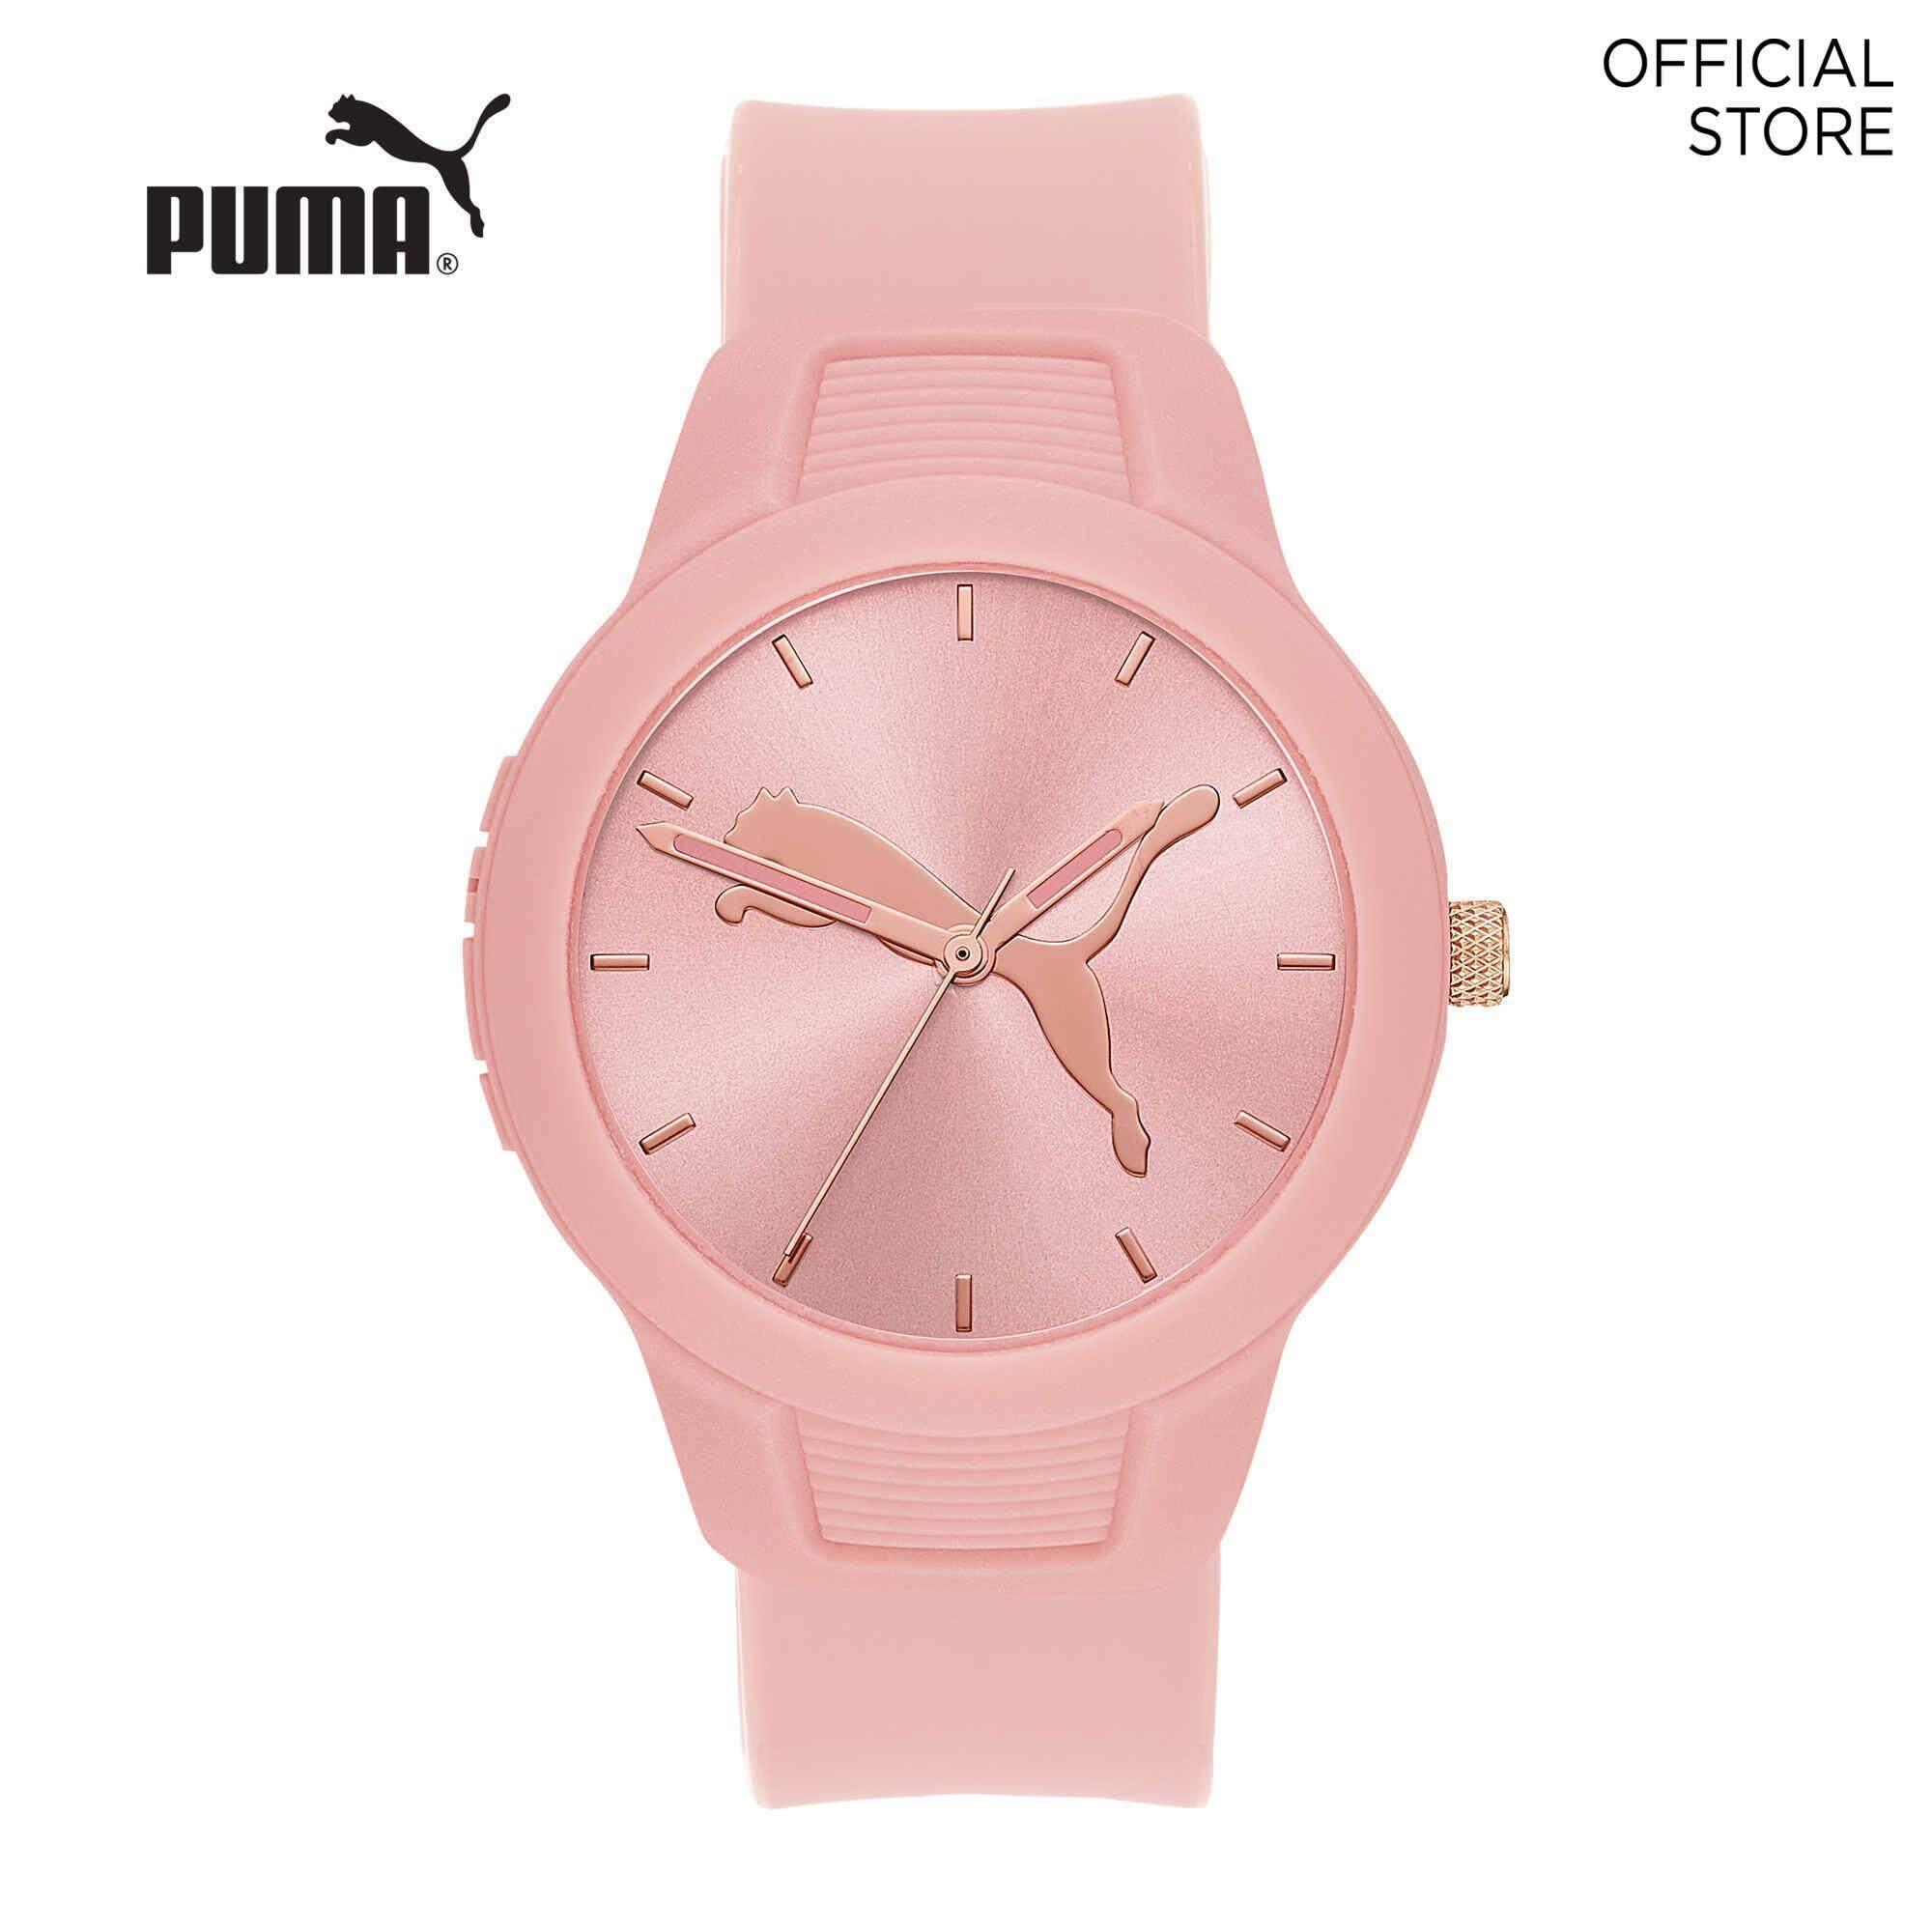 Puma Reset V2 Pink Watch P1023 Malaysia